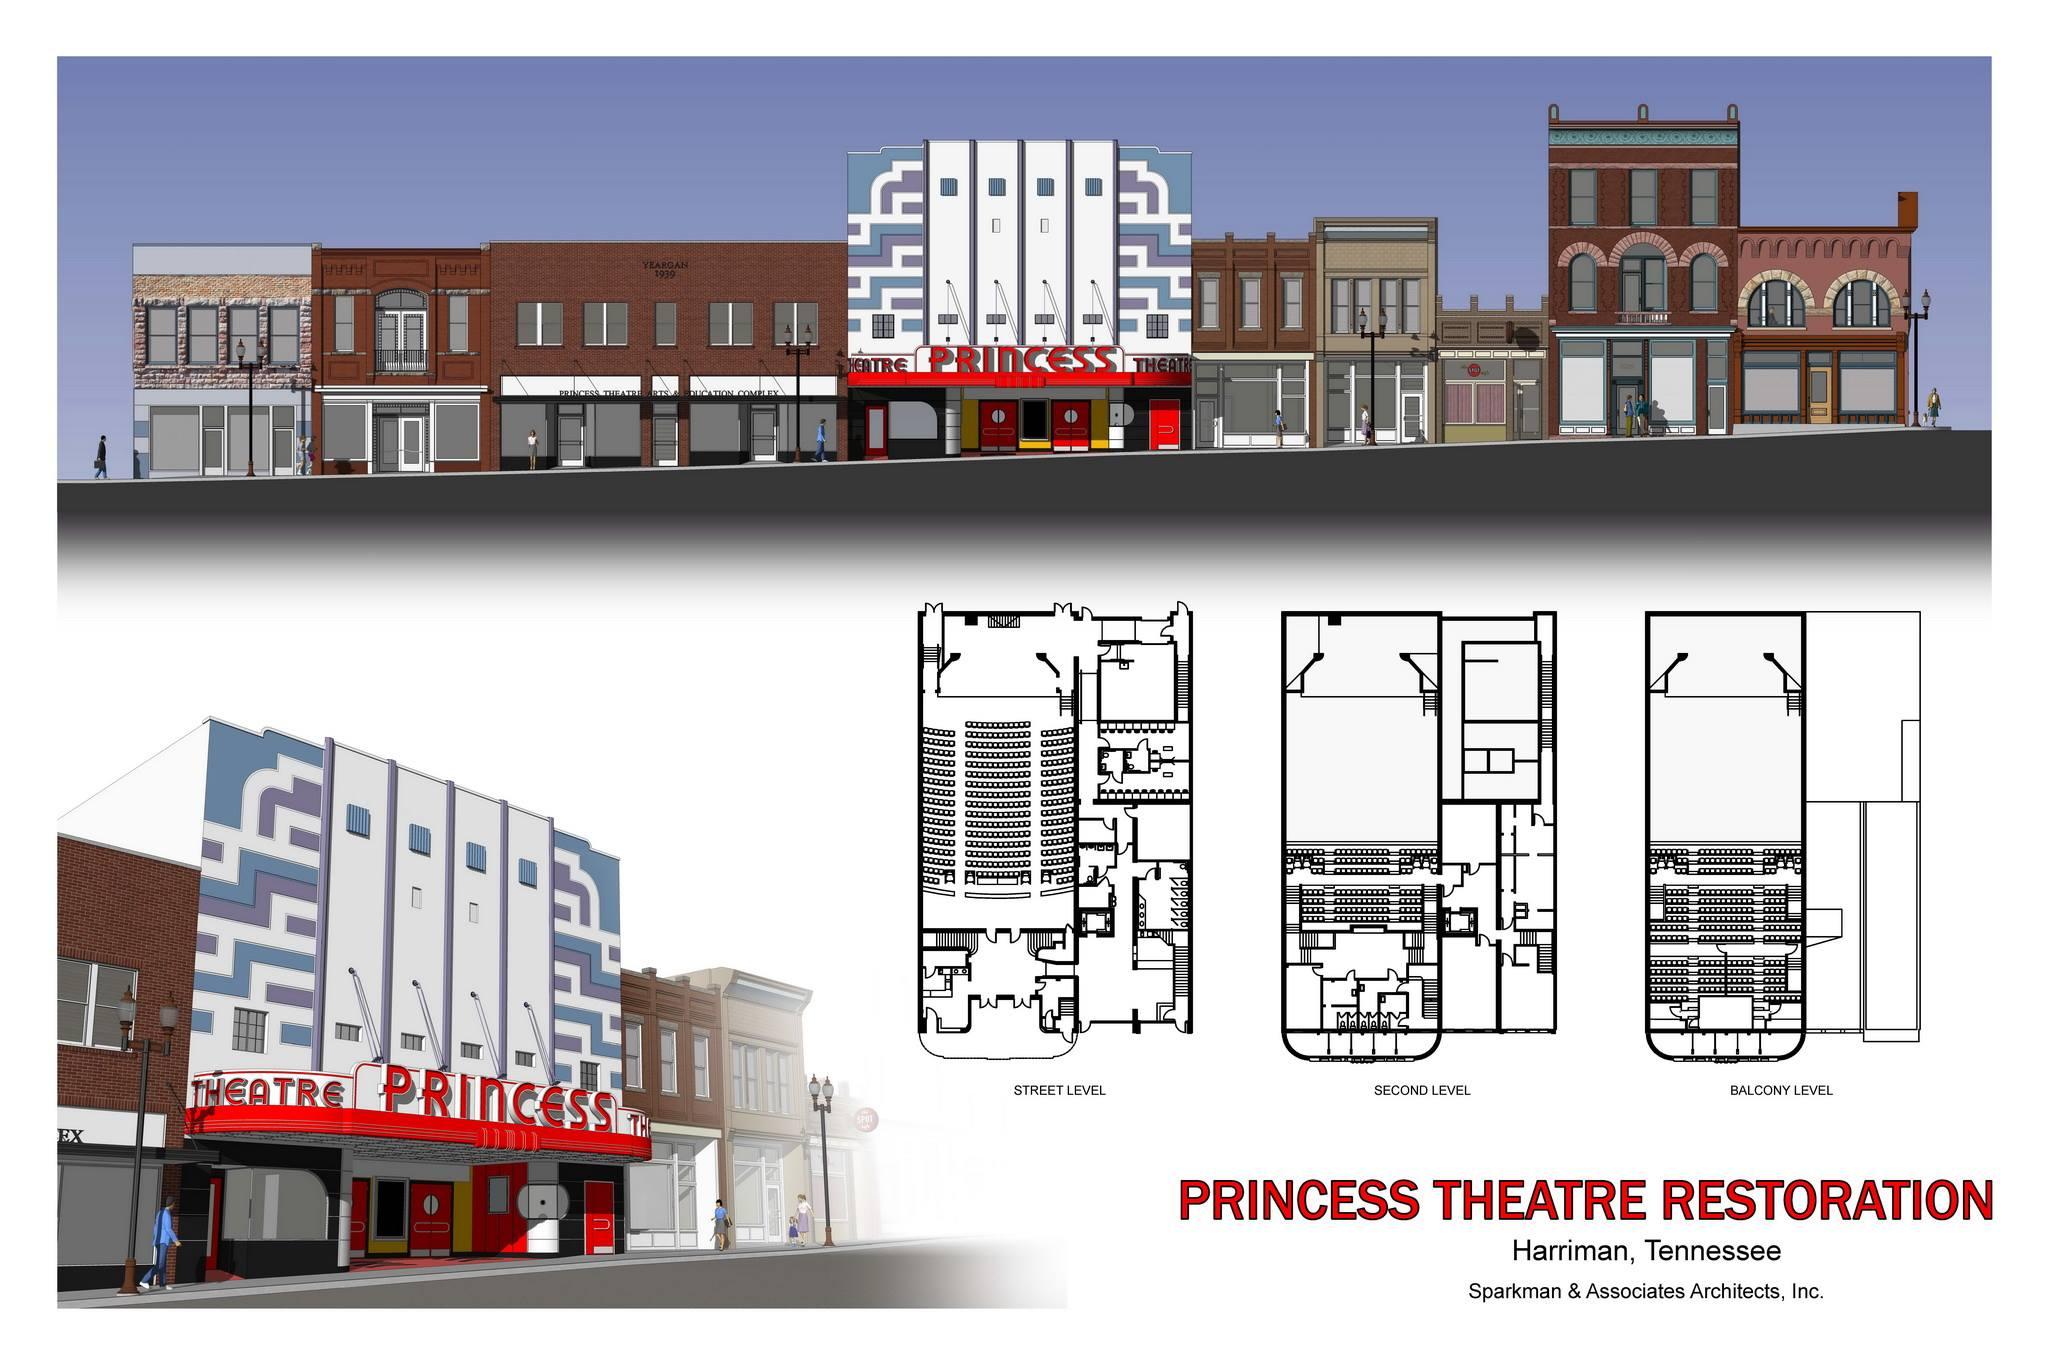 DataCAD Demo - Princess Theatre Restoration